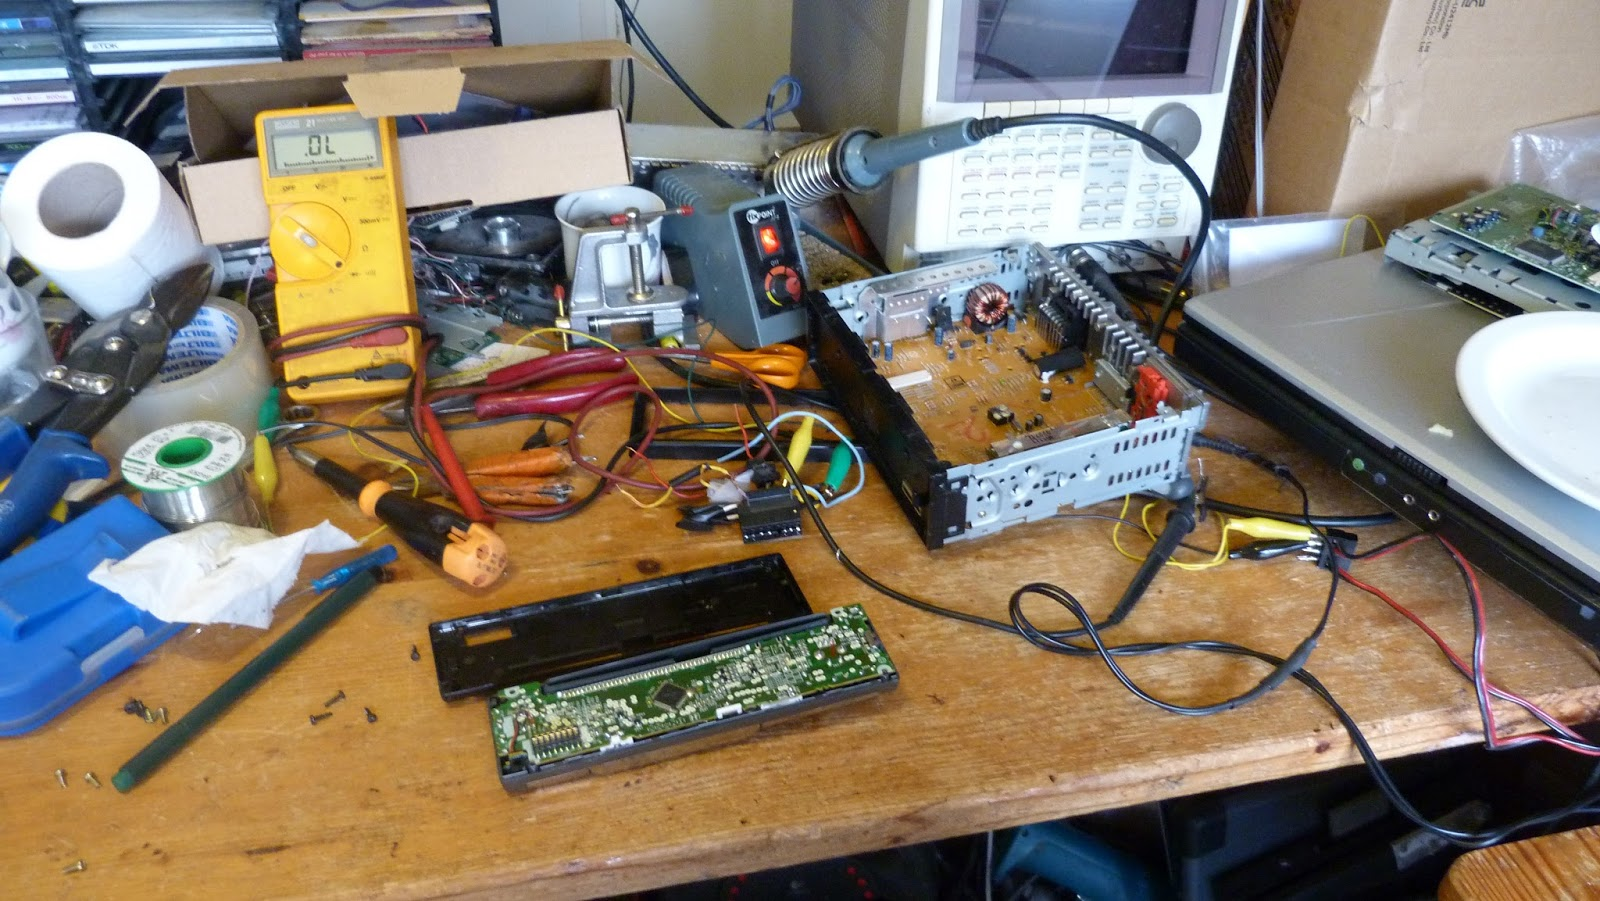 Säätö Lärä: Modding car stereo head unit with Arduino and